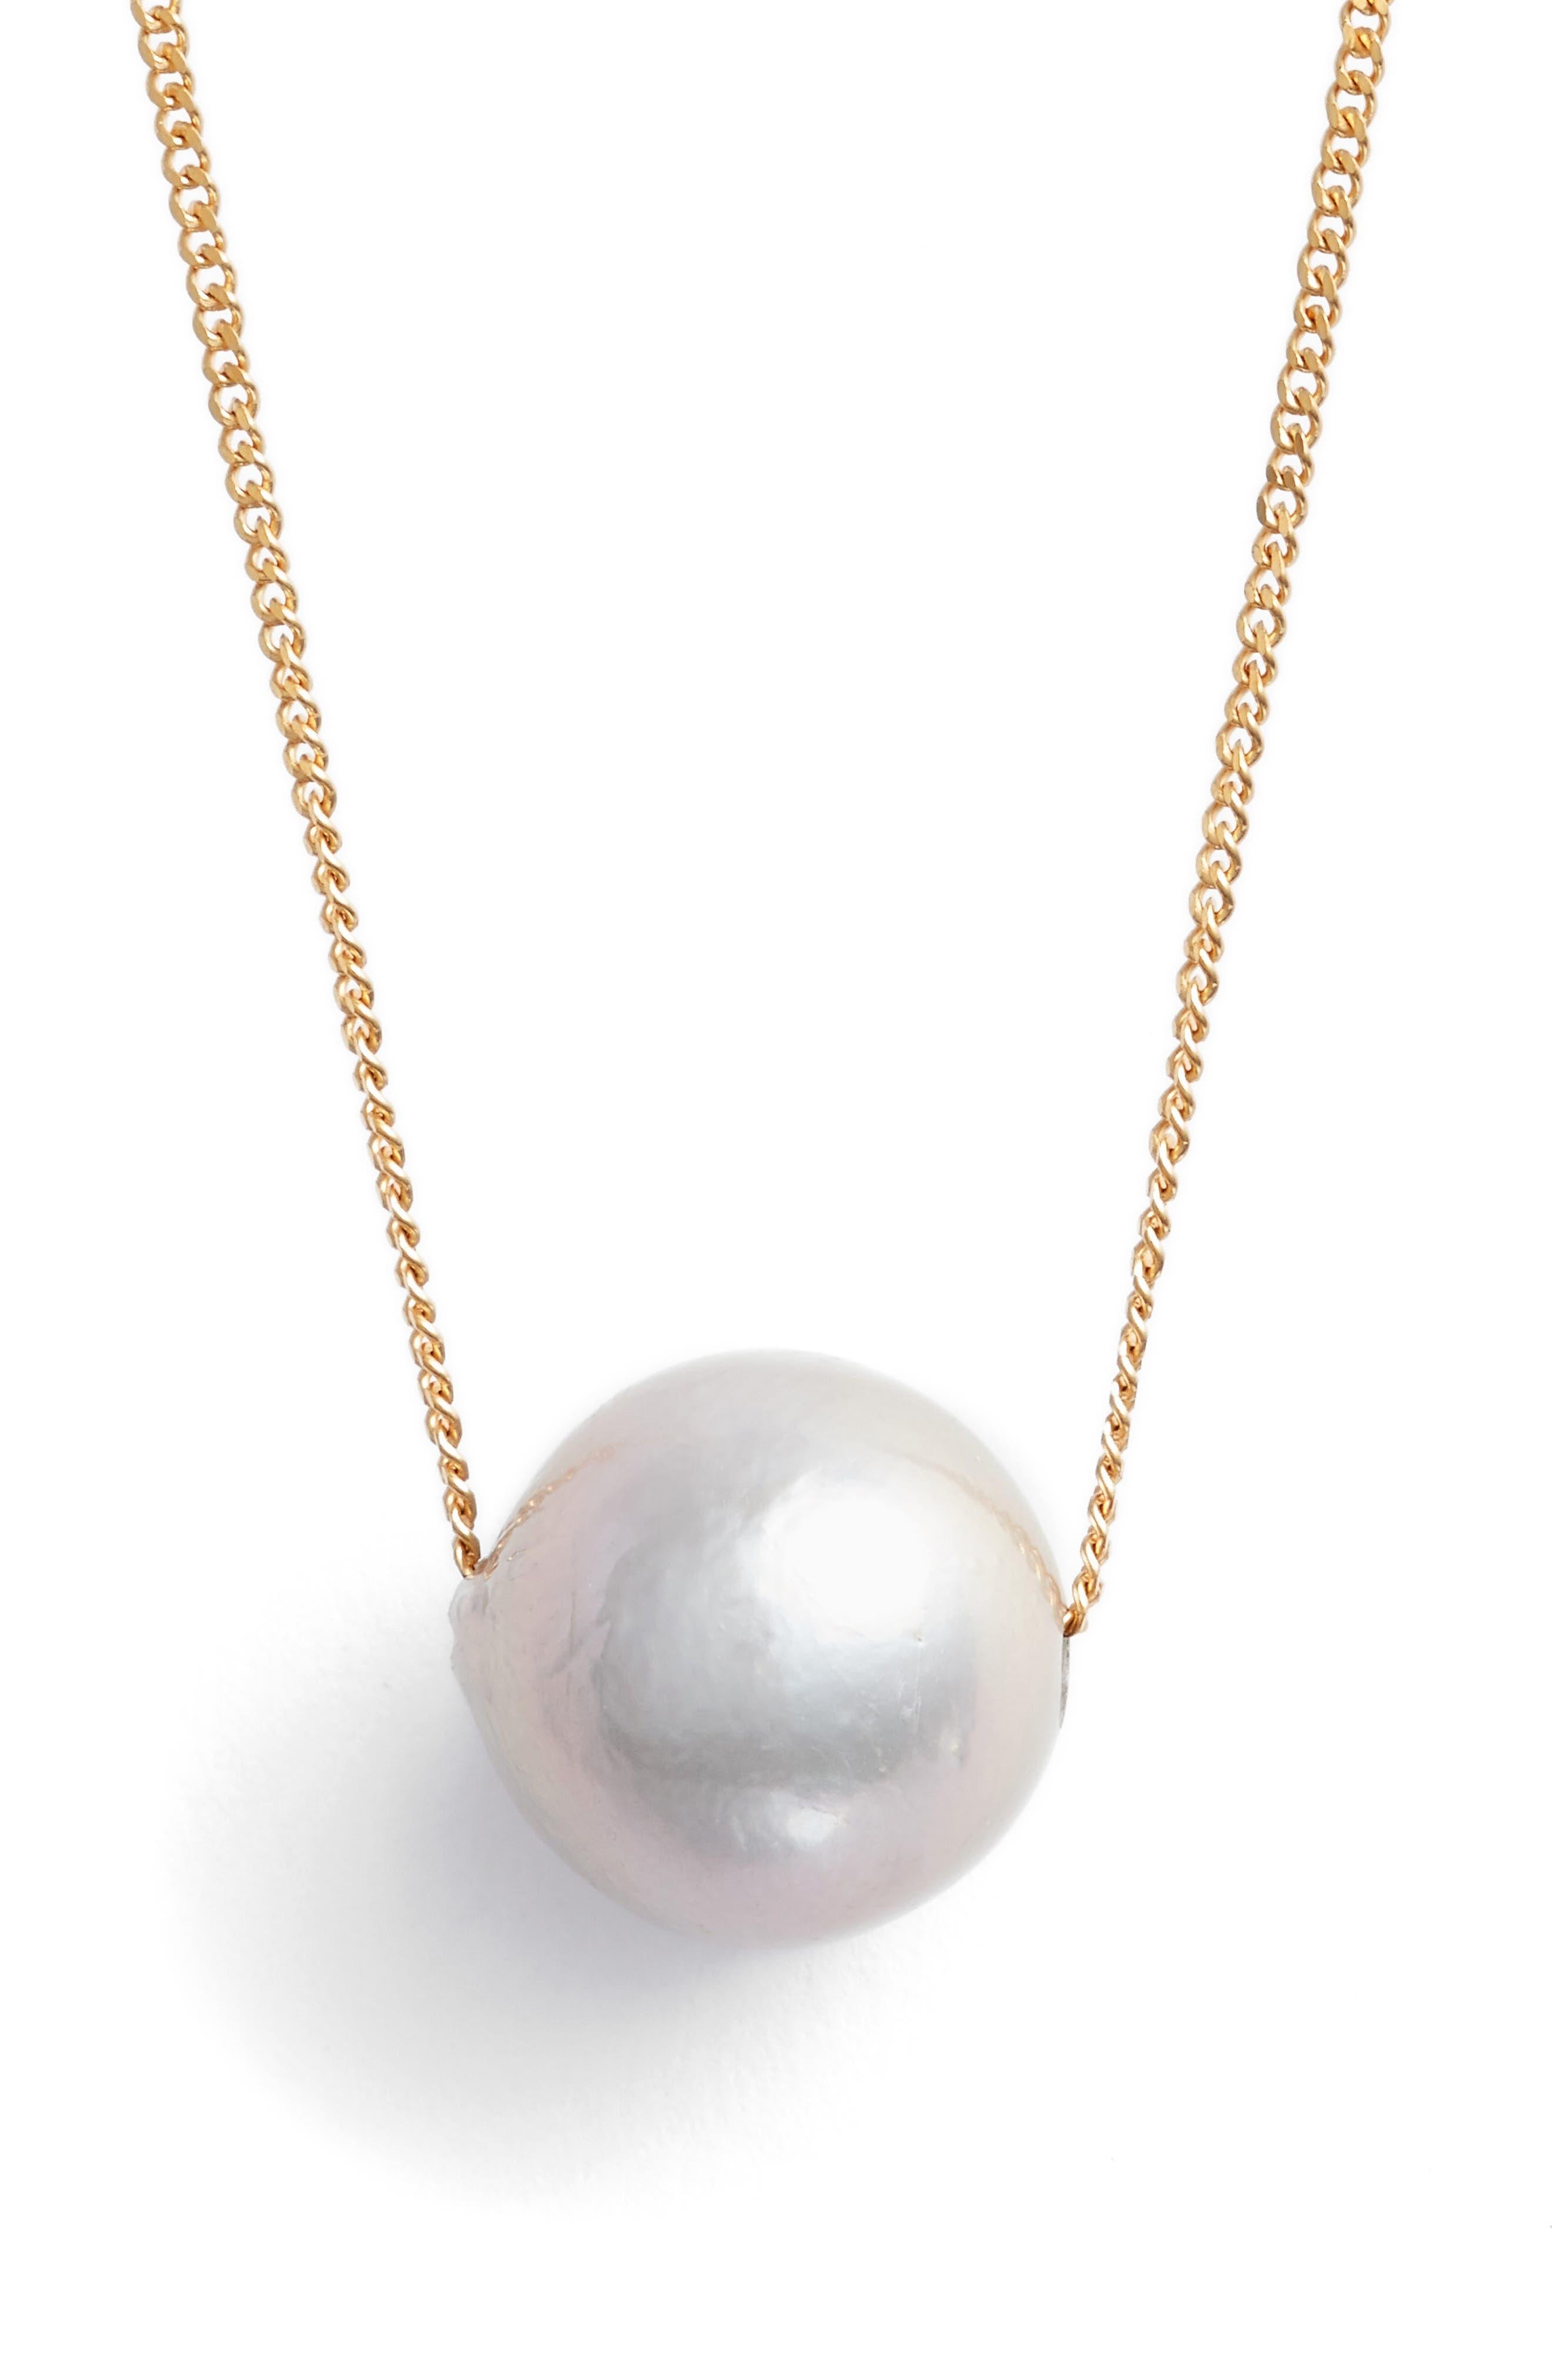 Main Image - Chan Luu Pearl Pendant Necklace